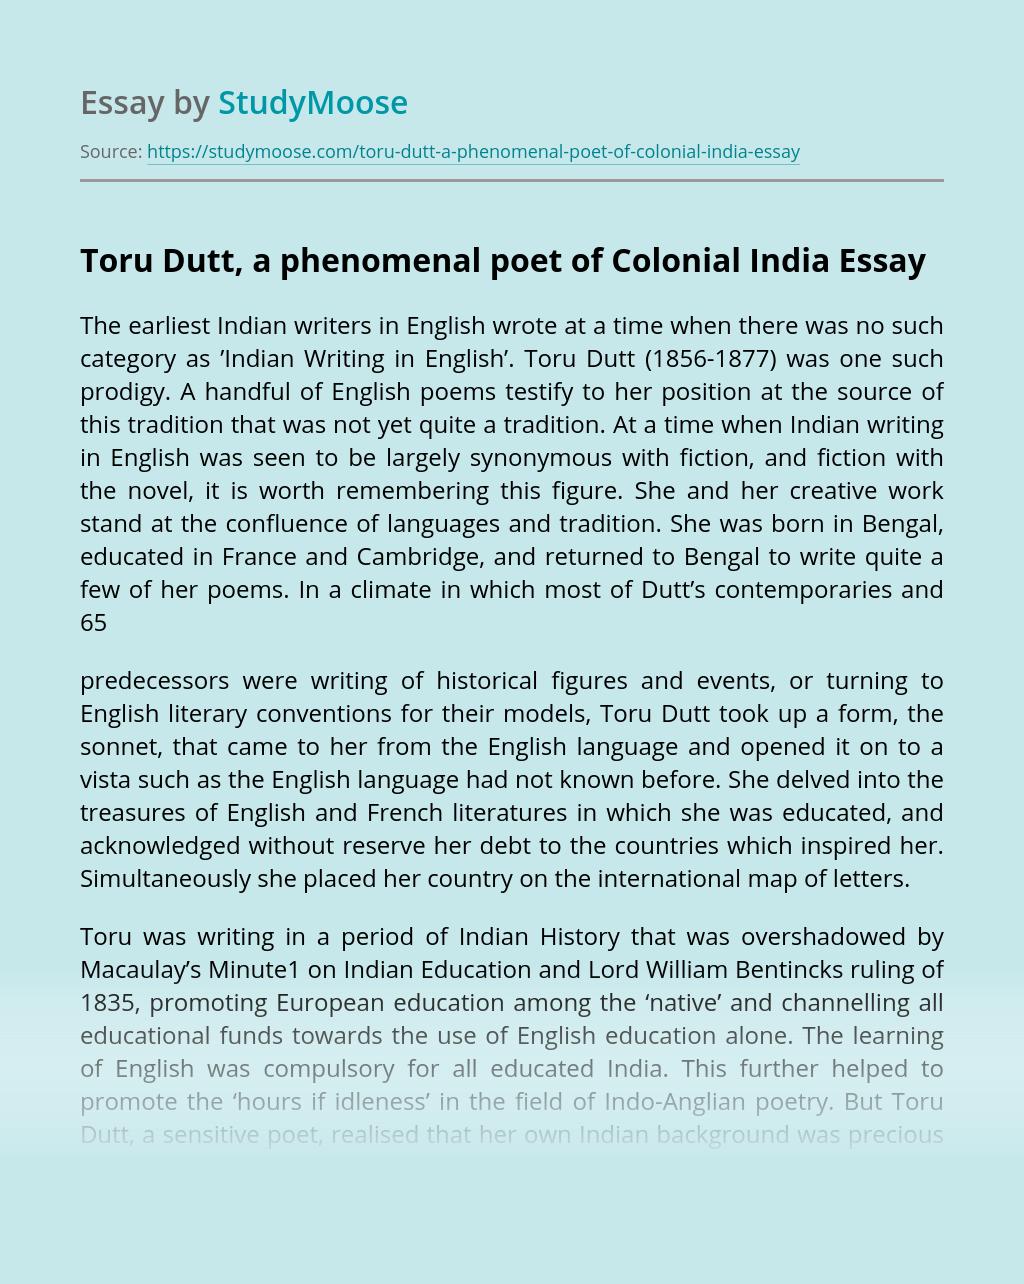 Toru Dutt, a phenomenal poet of Colonial India